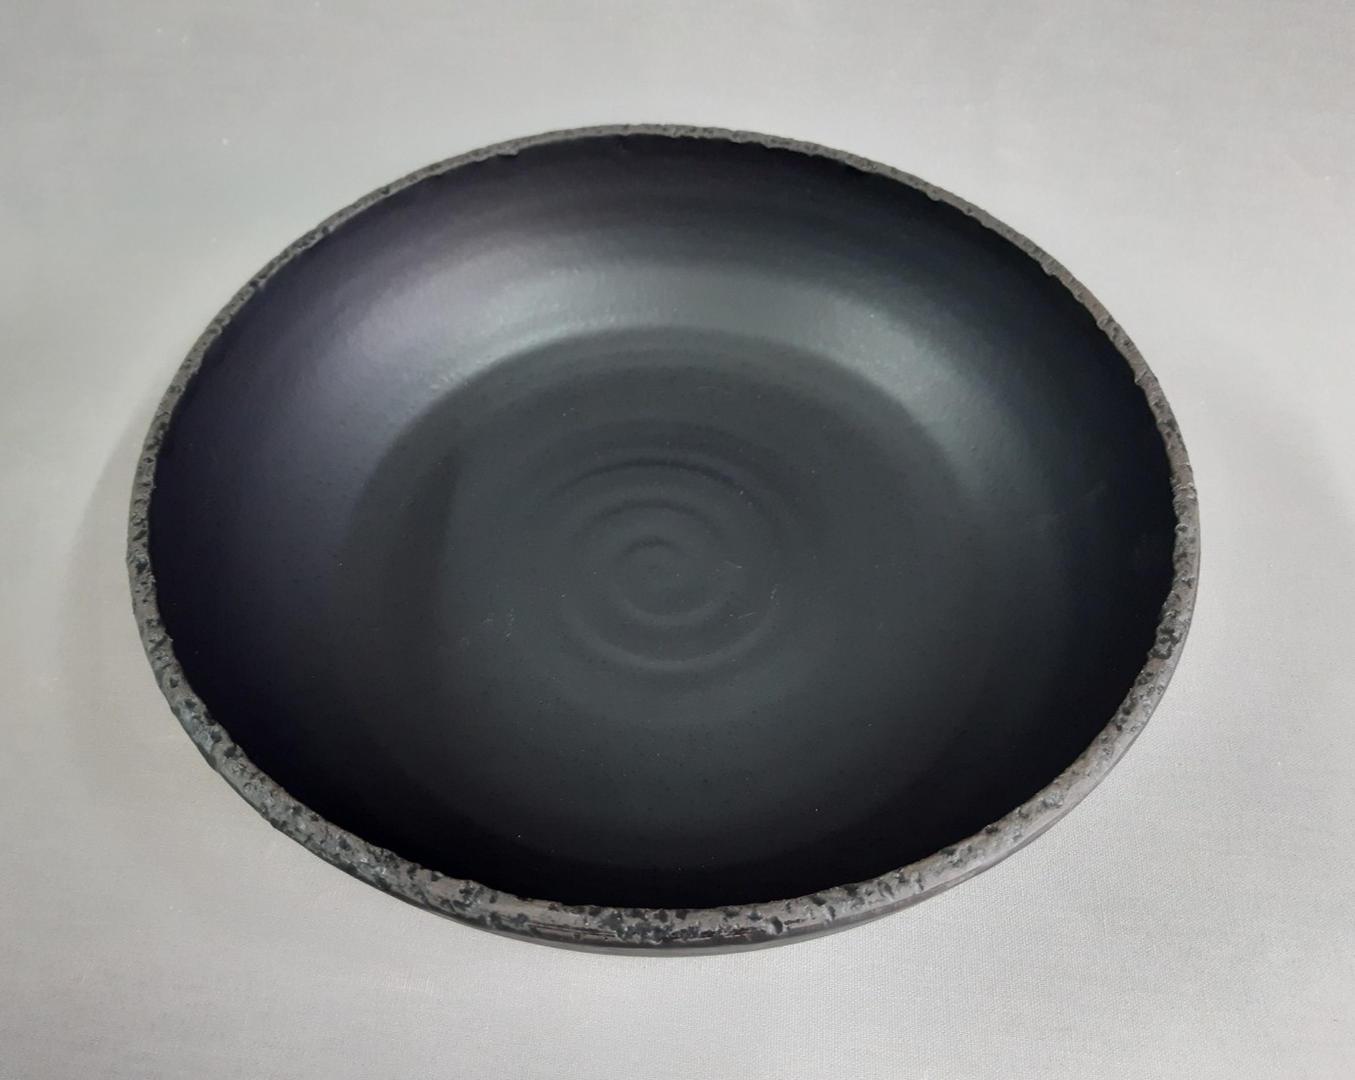 Big black rough edge bowl